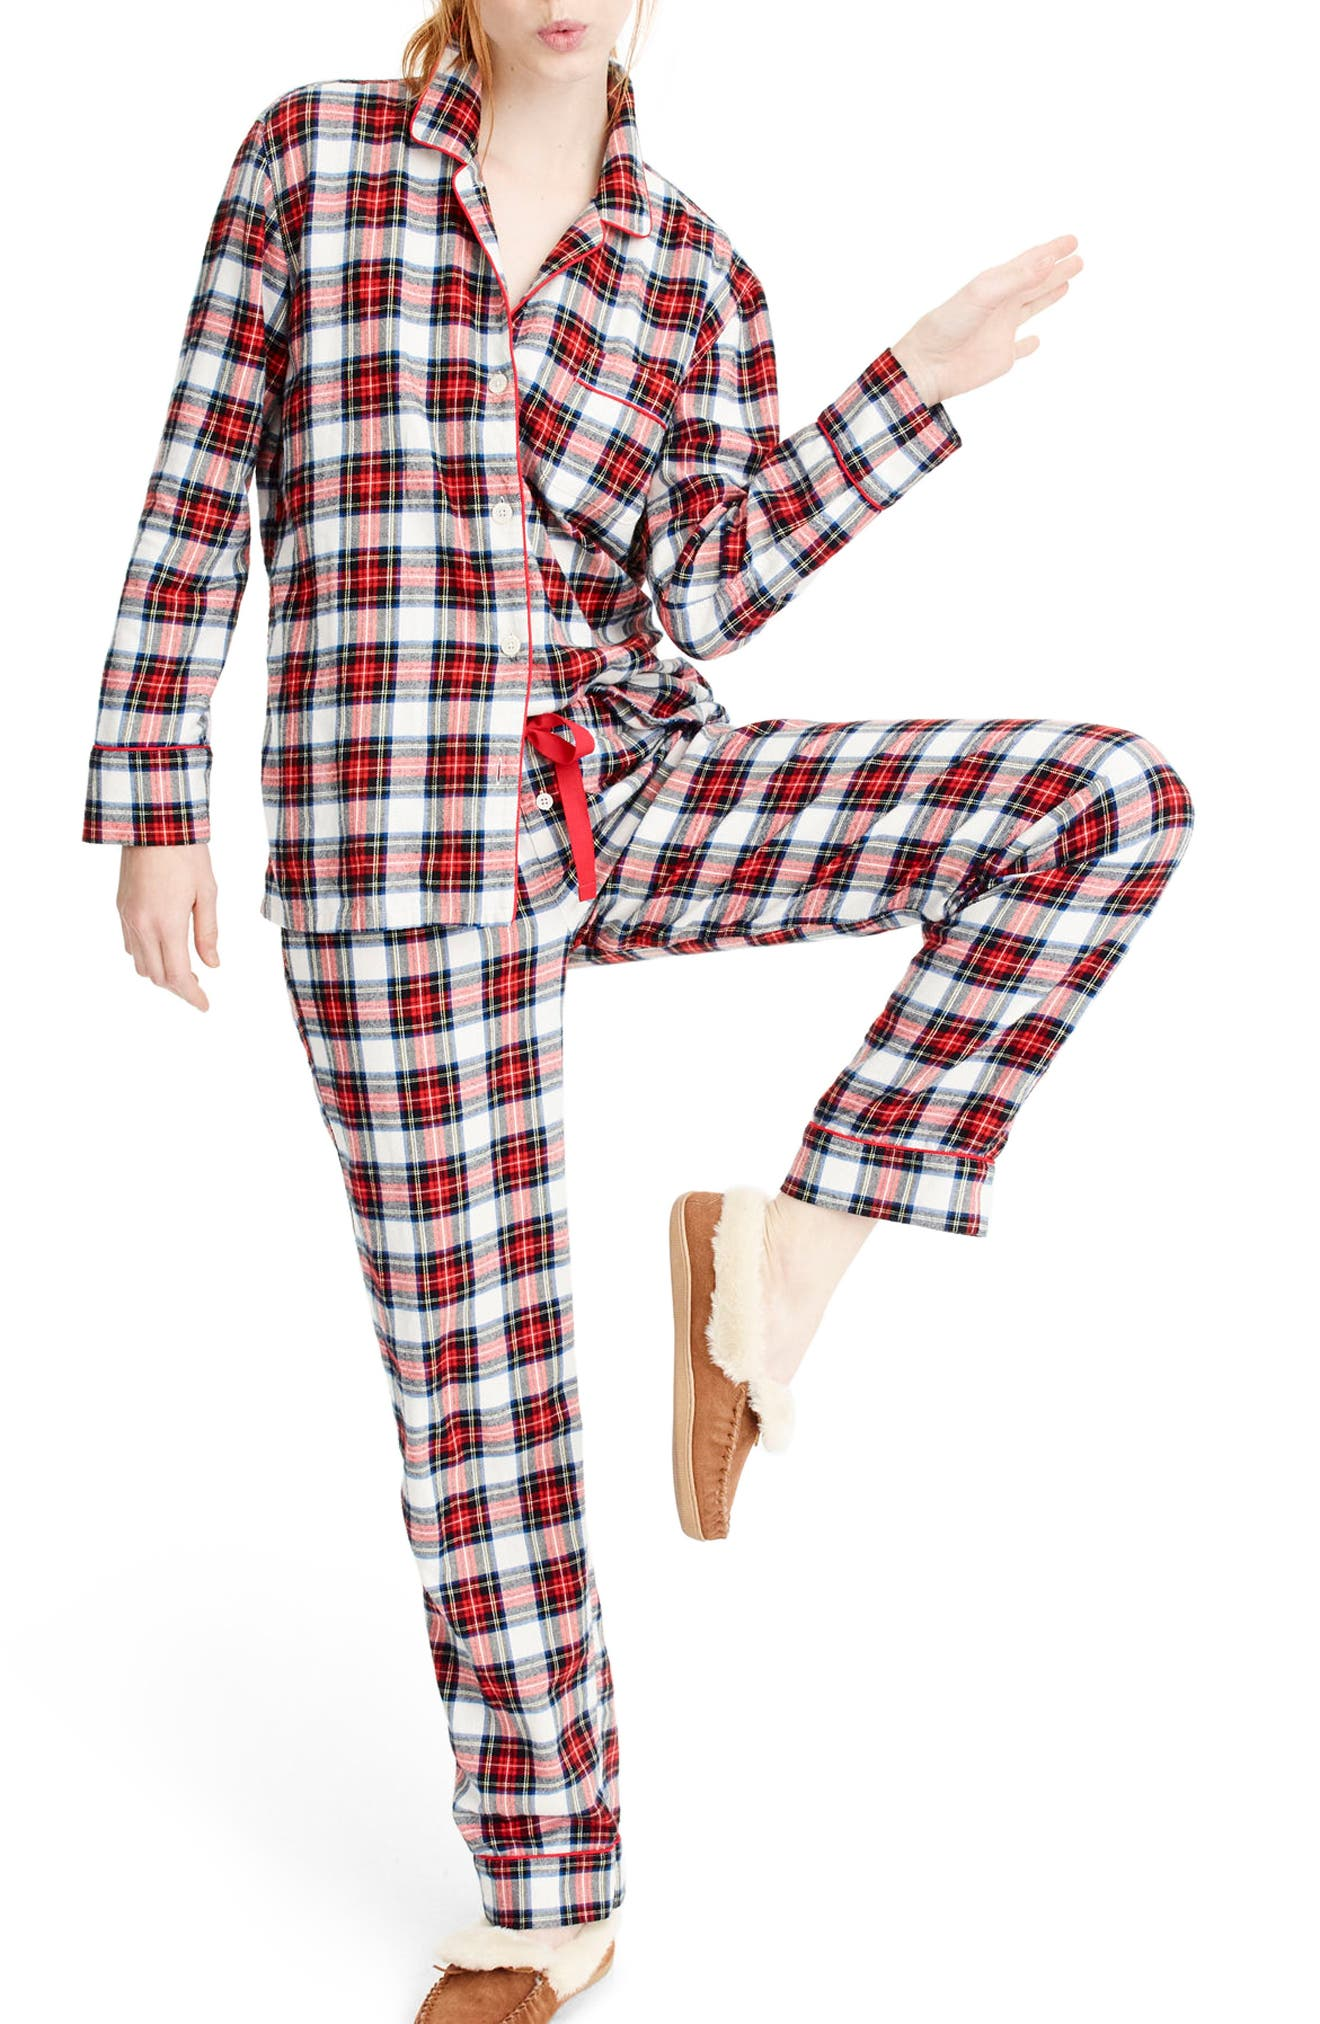 Main Image - J.Crew Whiteout Plaid Flannel Pajamas